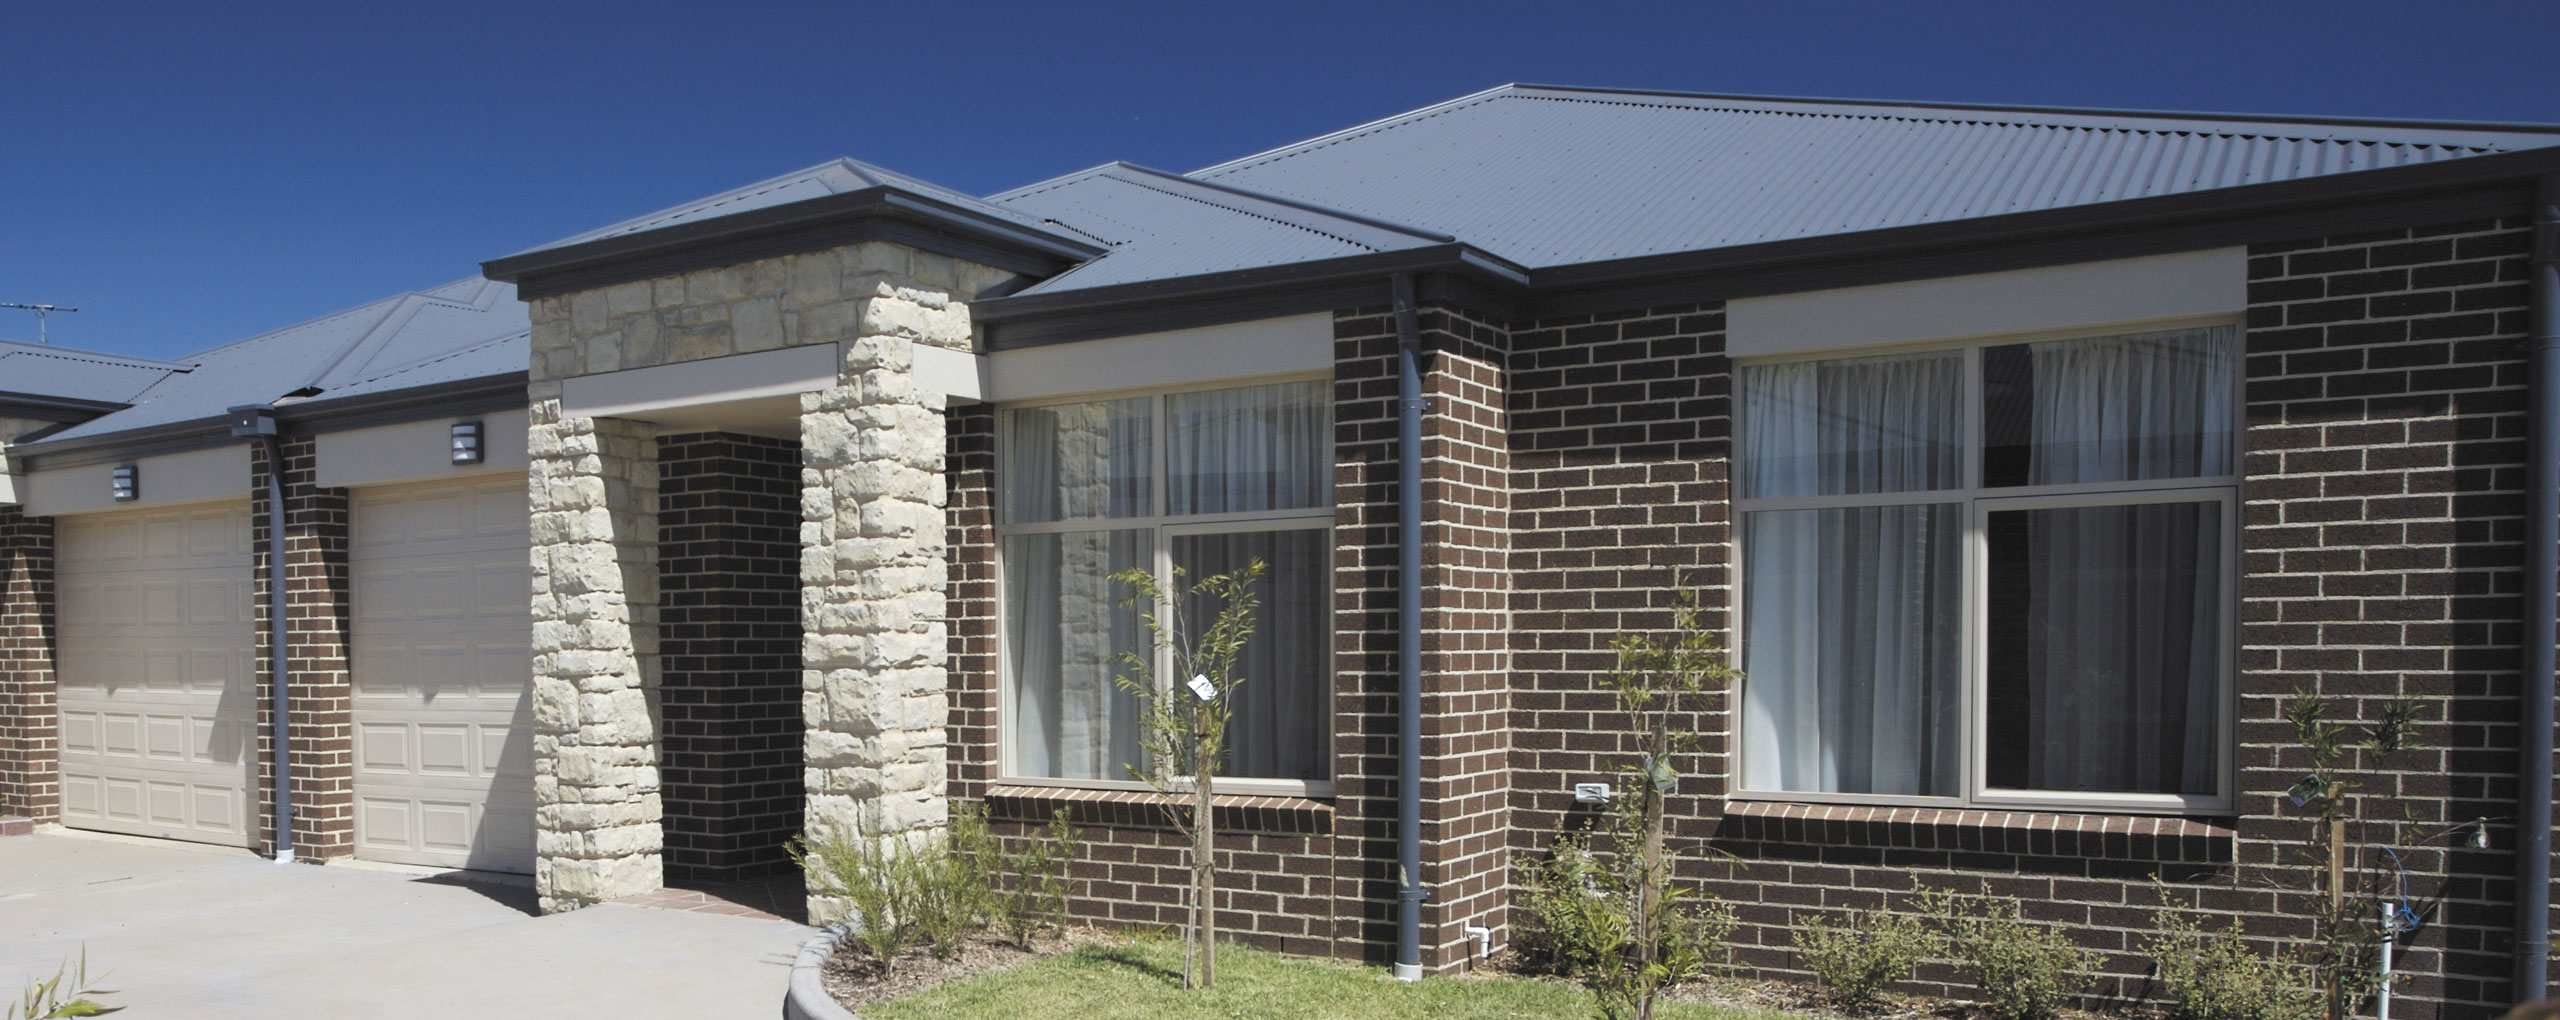 Elegant Bricks U0026 Pavers   Austral Bricks. House FacadesHouse ...